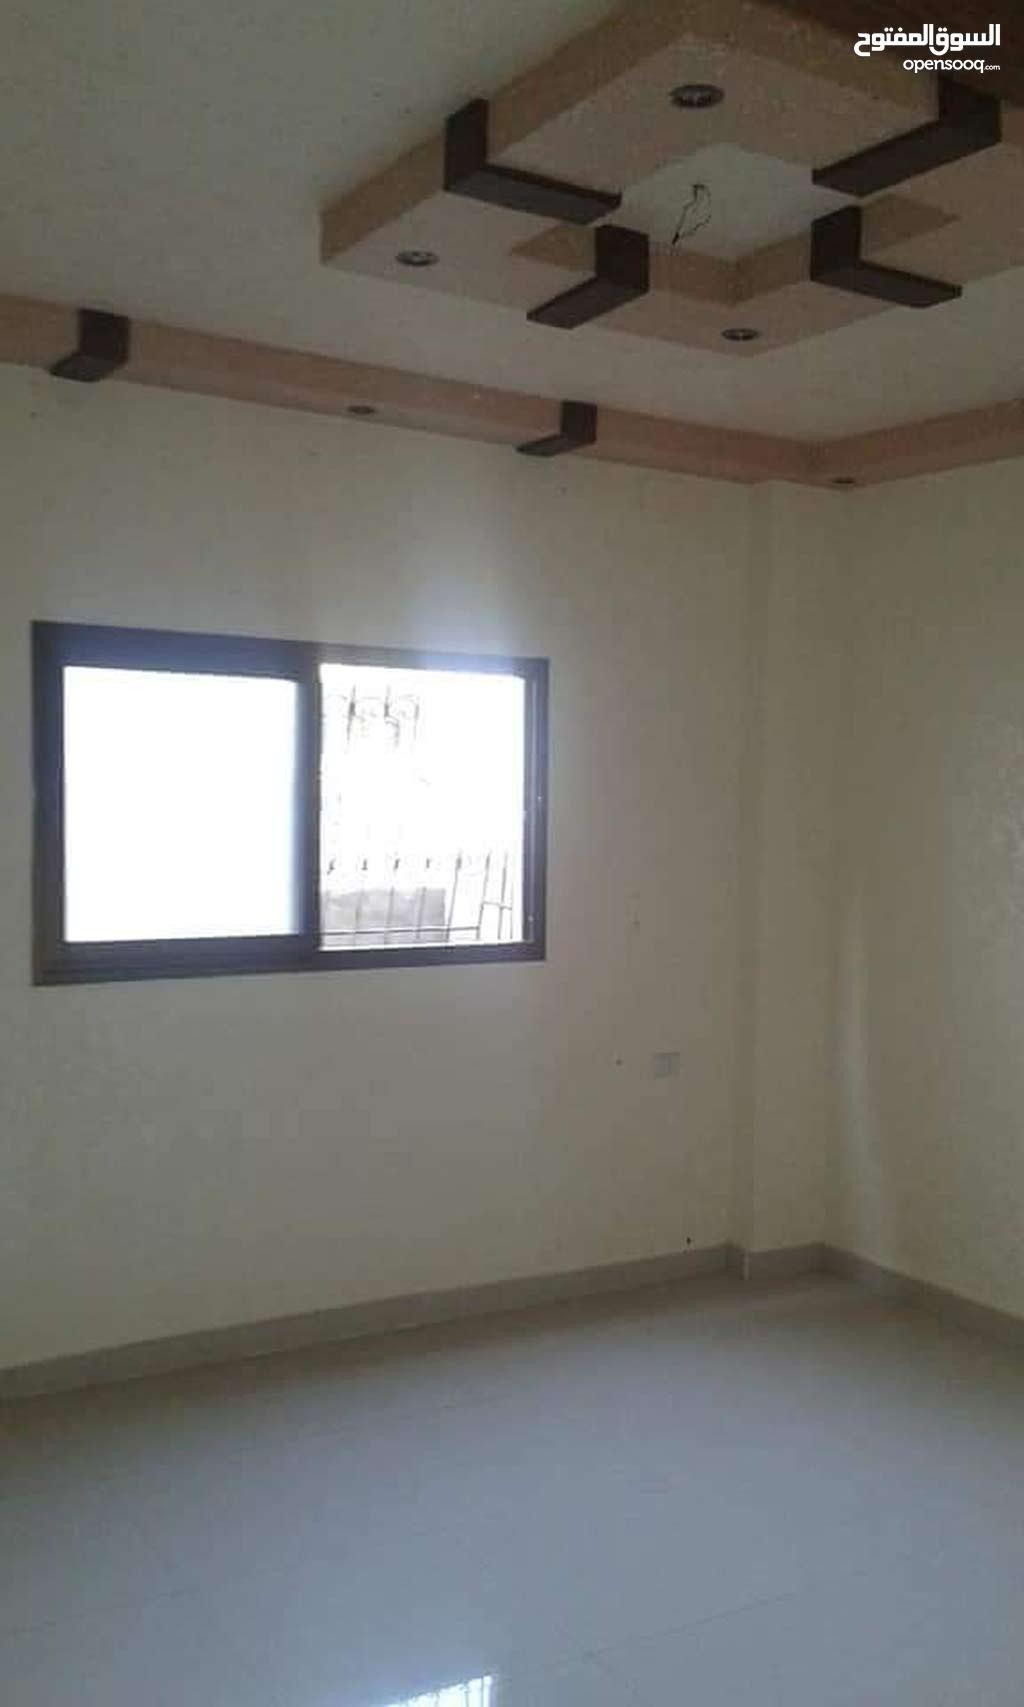 شقة للبيع   4a8a2f279f3329895331d38f4b529522cfa4d6fd8d6cc4d71c053b846c2f5bac.jpg